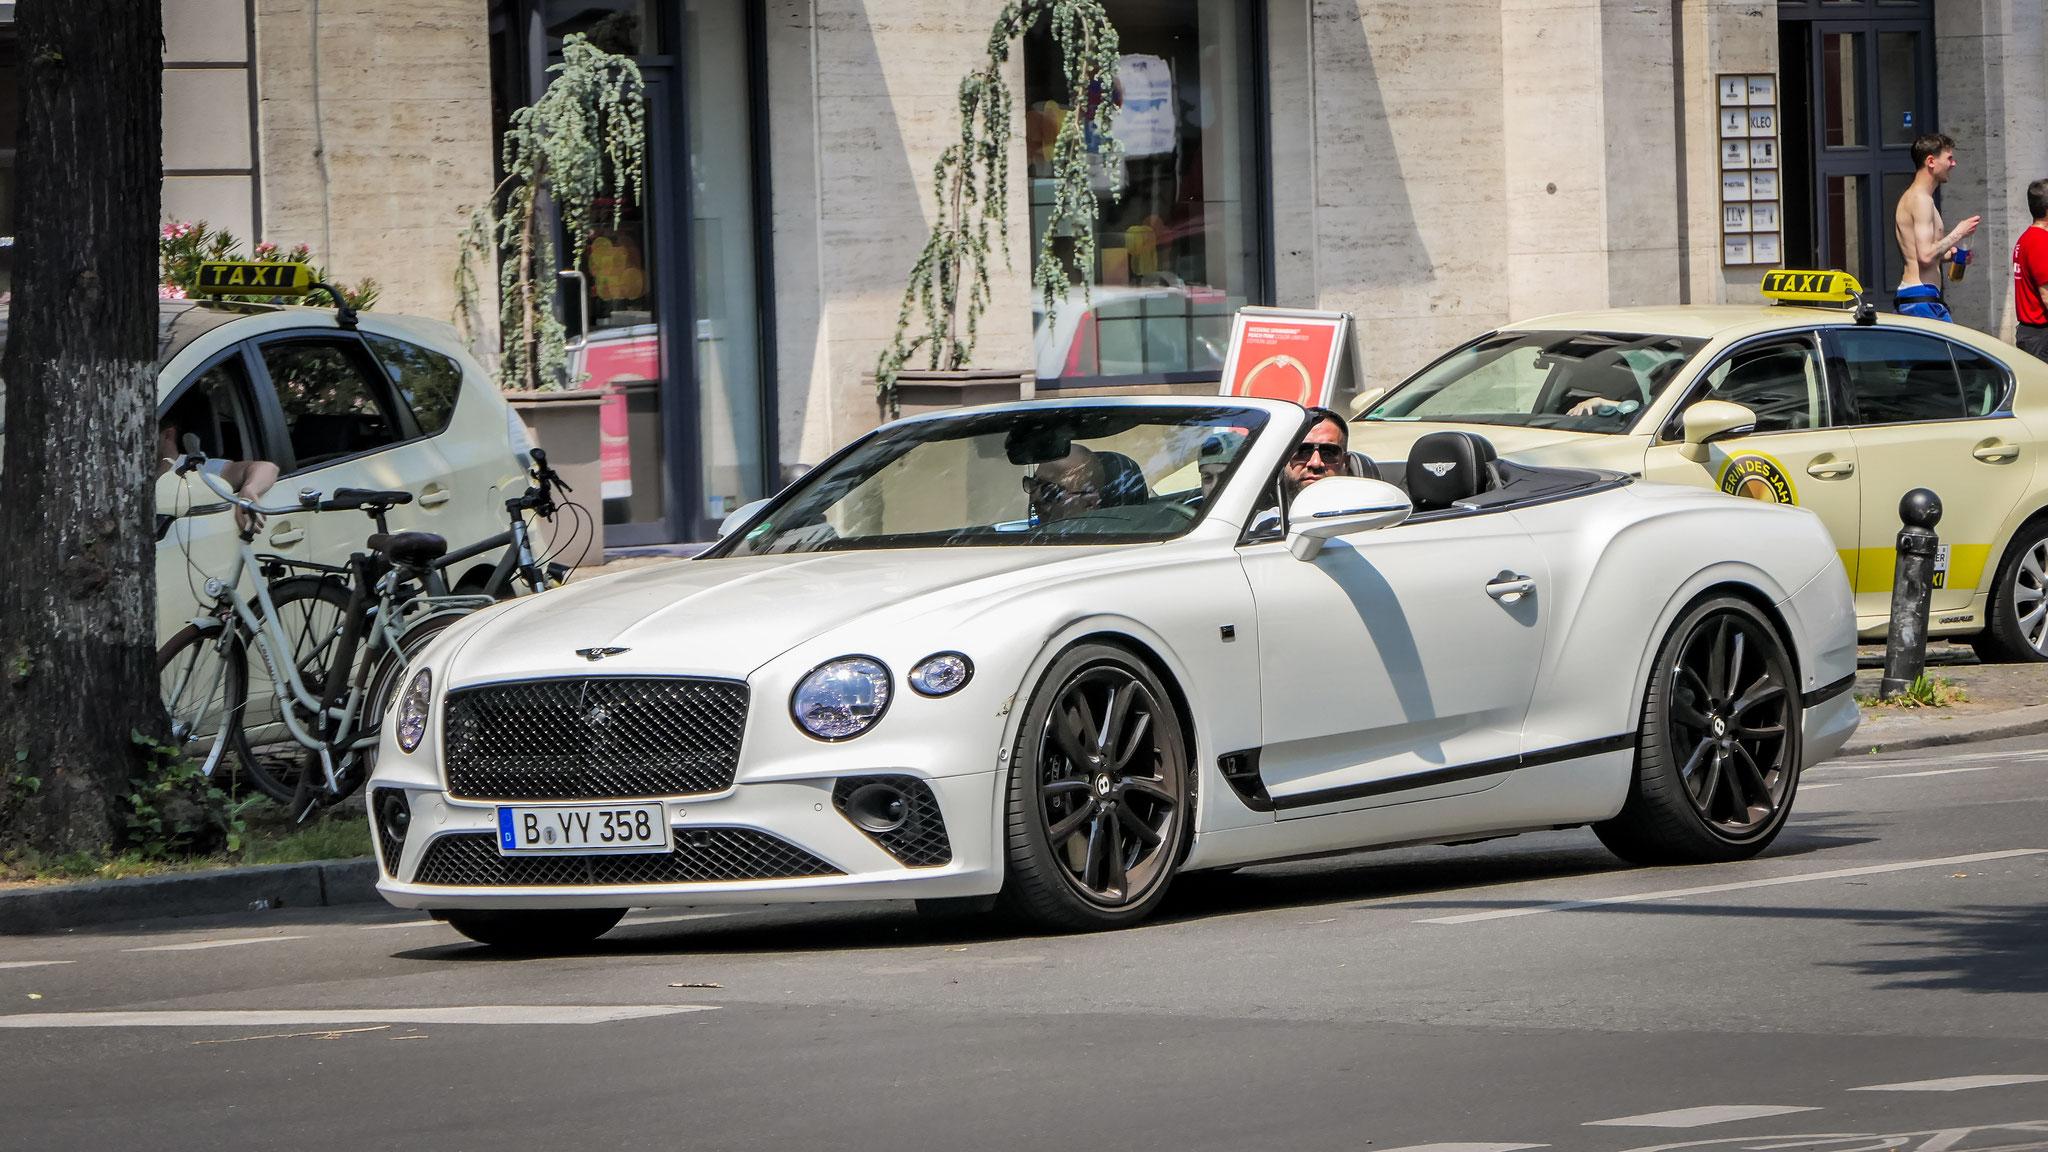 Bentley Continental GTC - B-YY-358